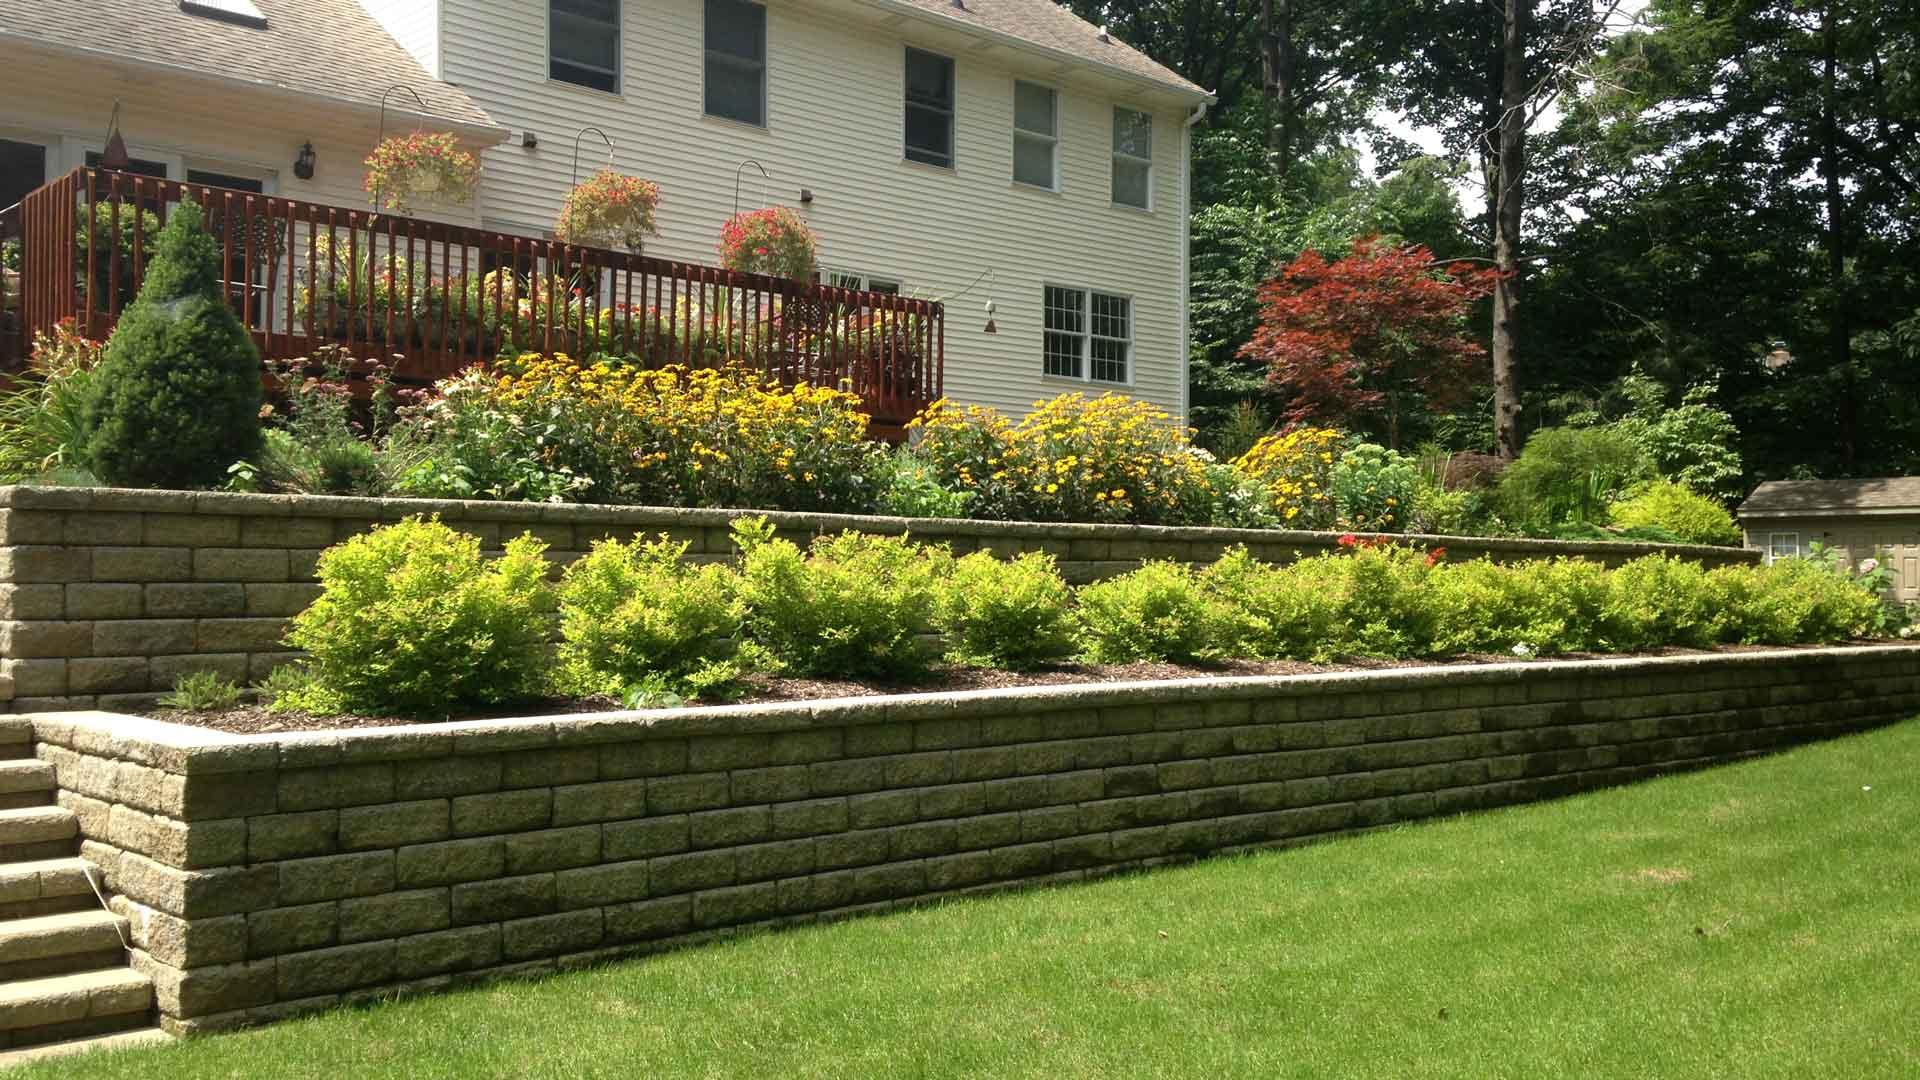 Auburn-Sky-Landscaping-Block-Wall-Steps-Planting-Beds.jpg